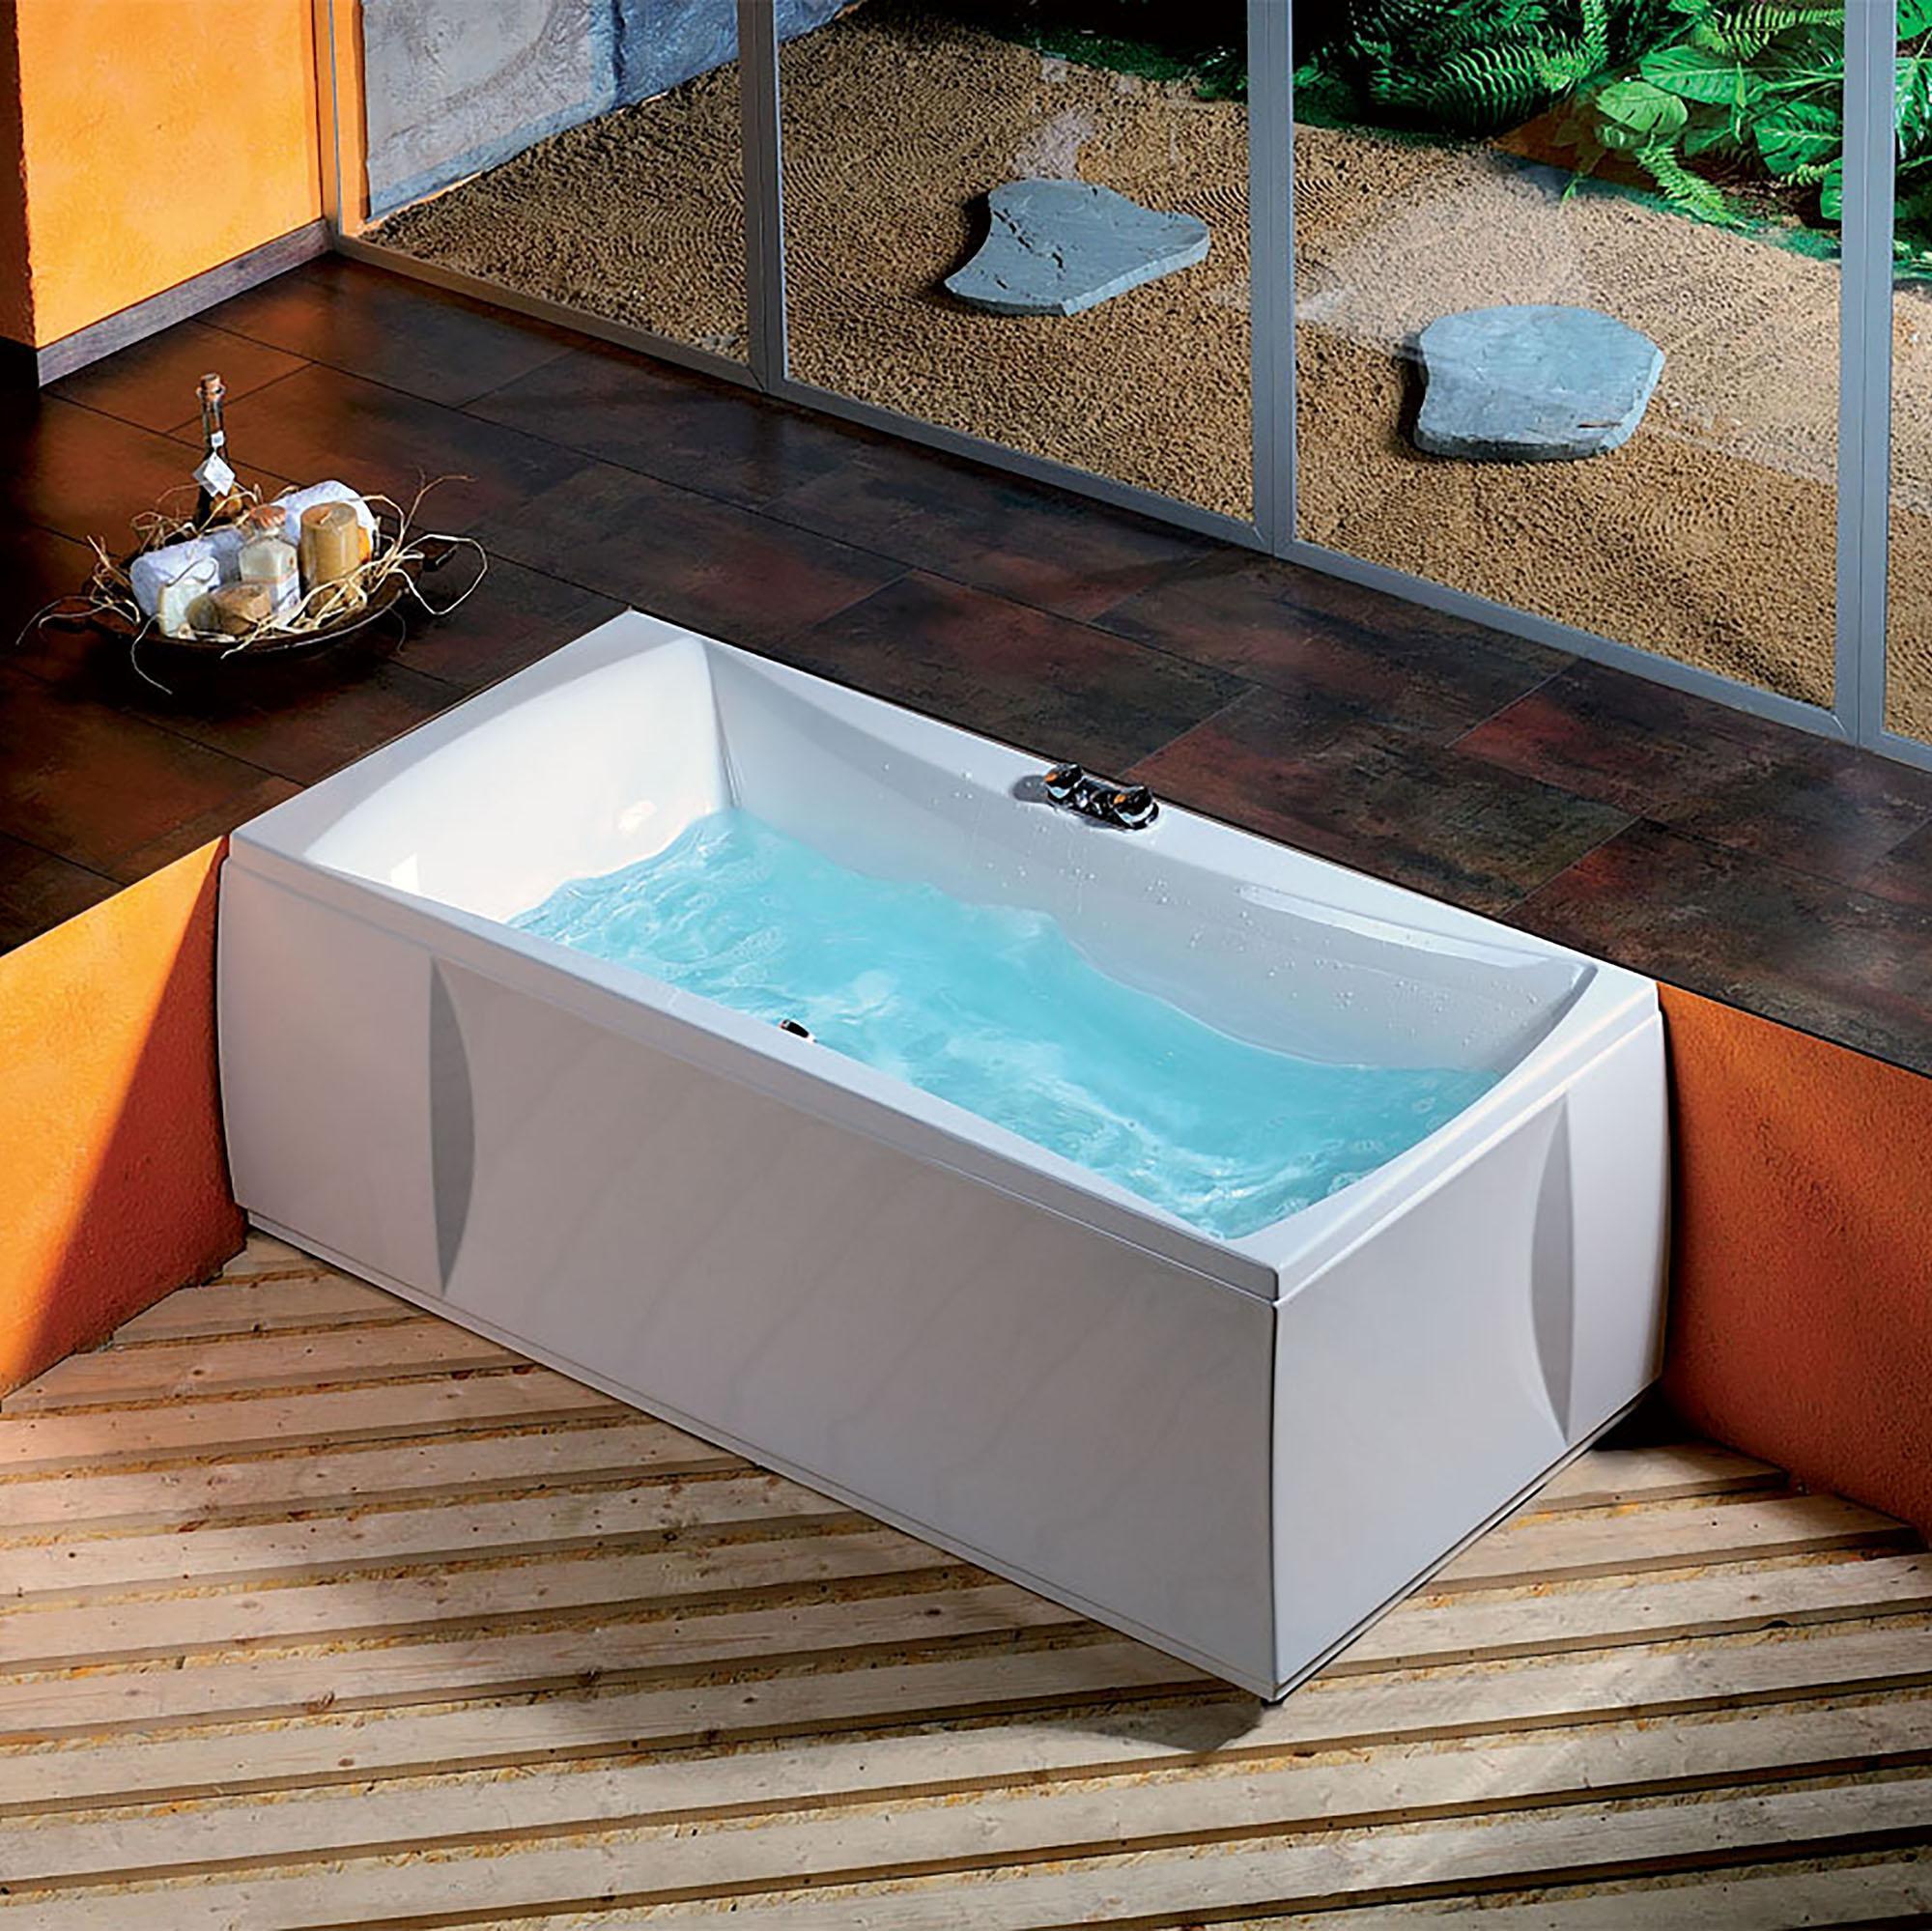 Акриловая ванна Alpen Alia 180x80 vis a vis vis a vis vi003ewius46